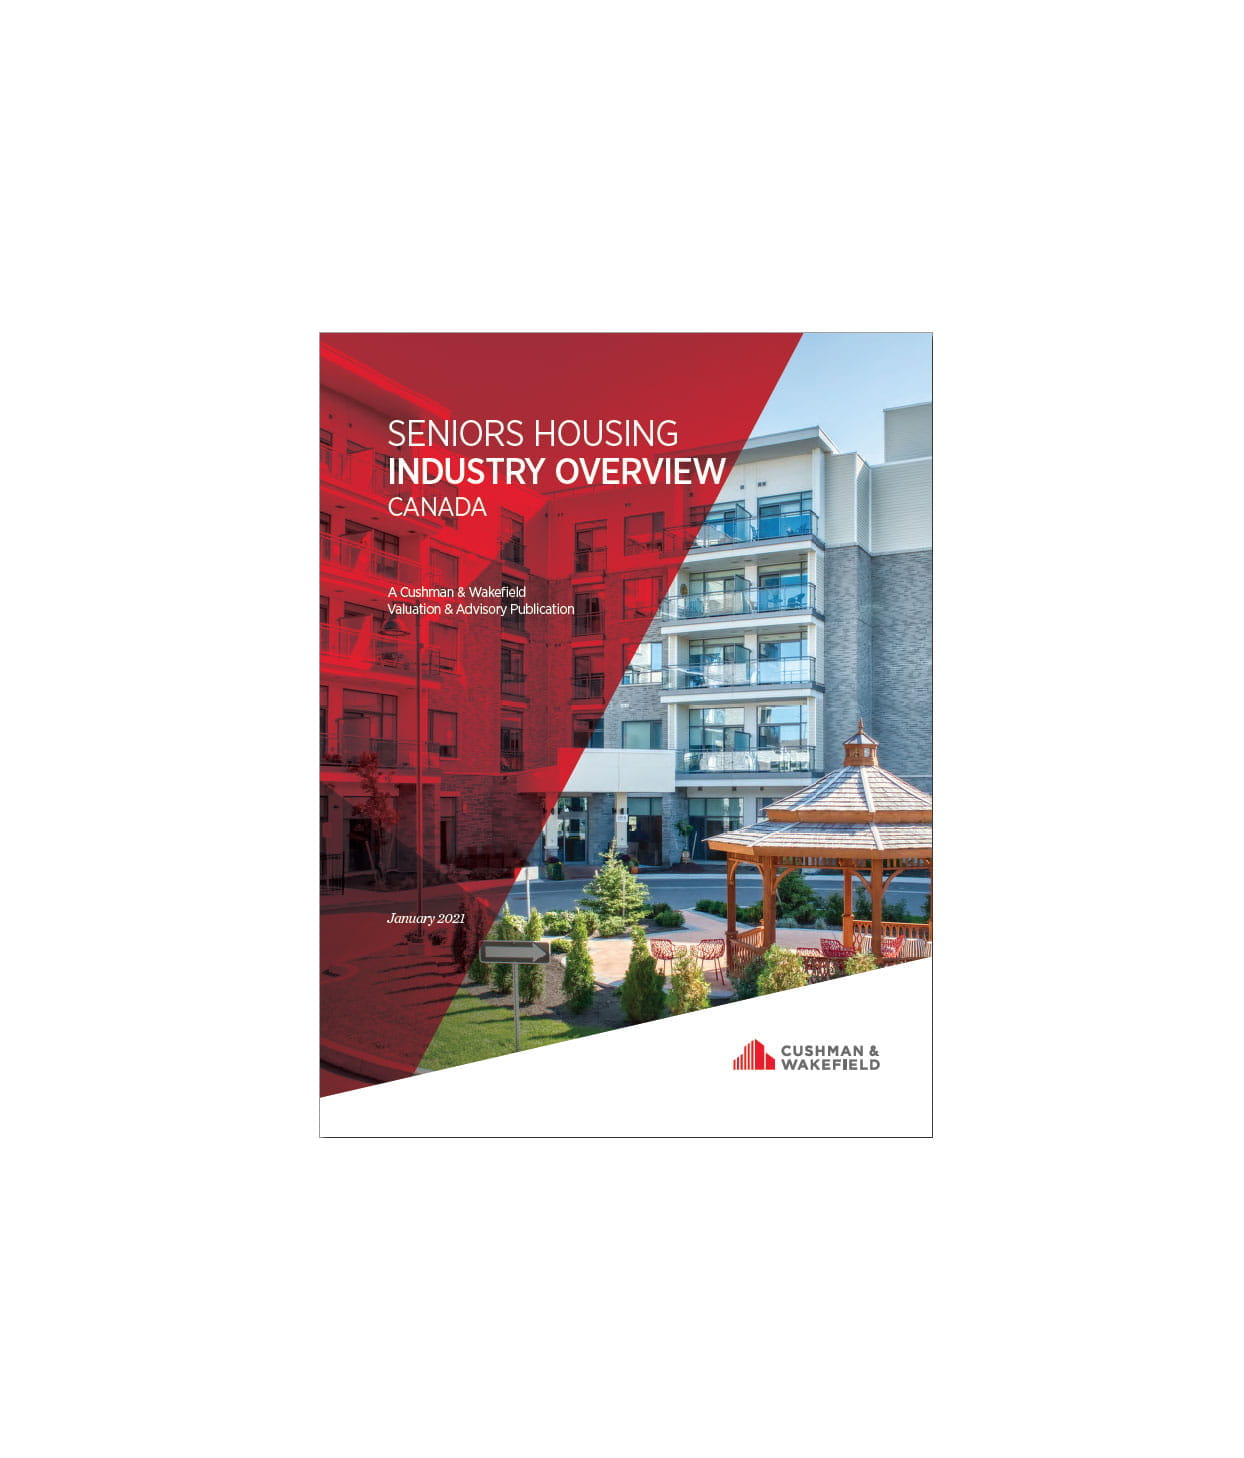 Canadian Seniors Housing Report (image)